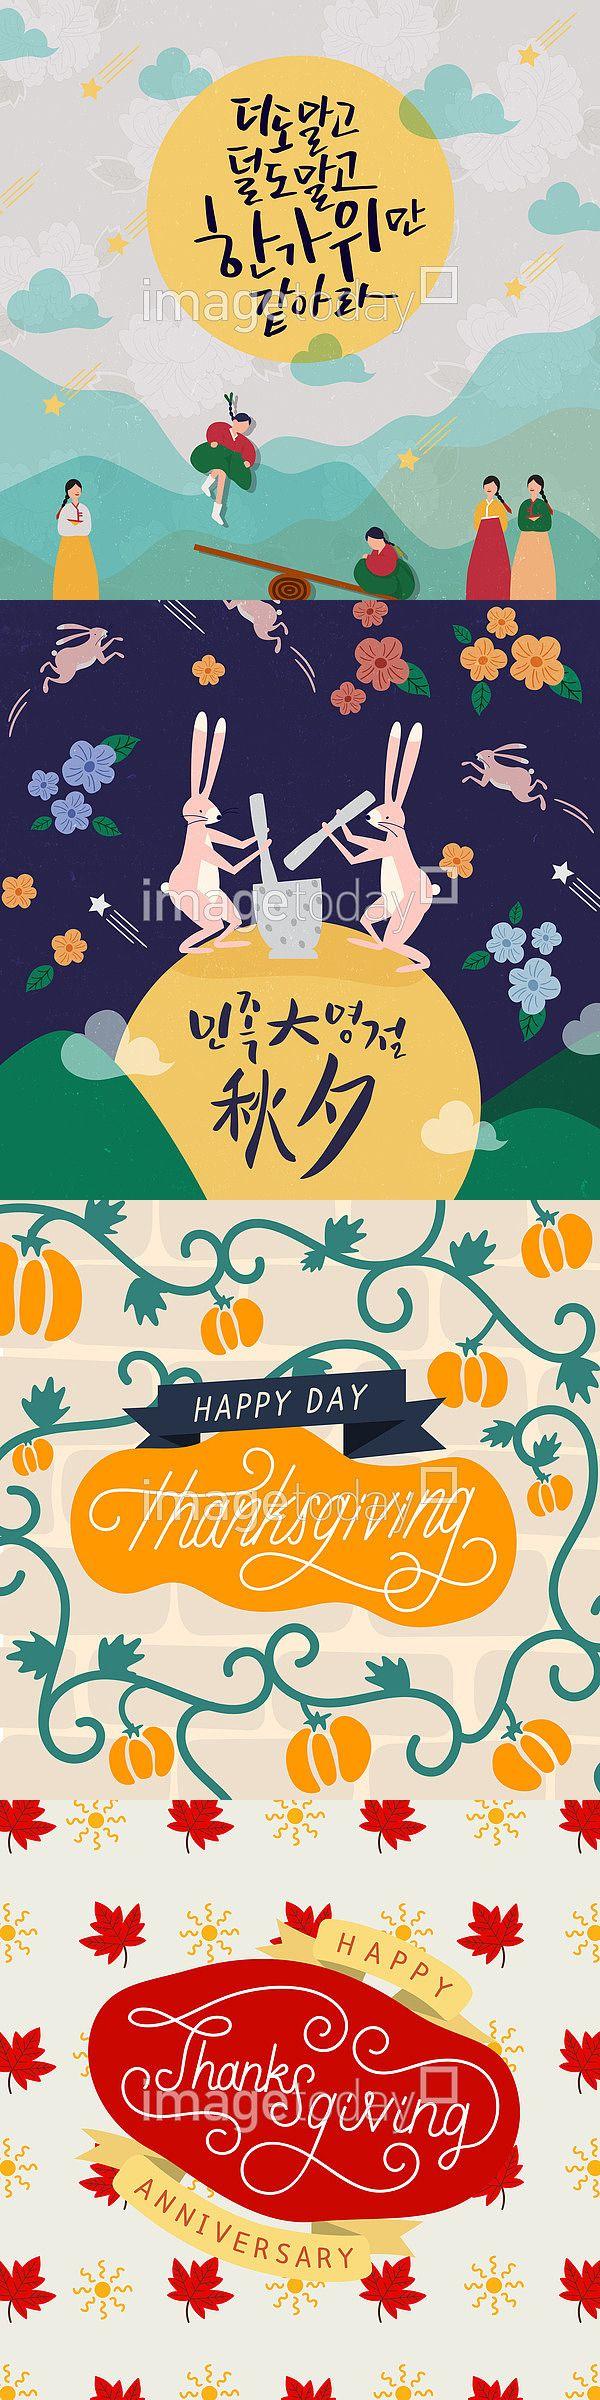 PSD 가을 감사 계절 기념일 꽃 단풍 단풍잎 레터링 리본 메시지 무늬 문자 백그라운드 사람없음 영어 추수감사절 캘리그래피 태양 페인터 프레임…